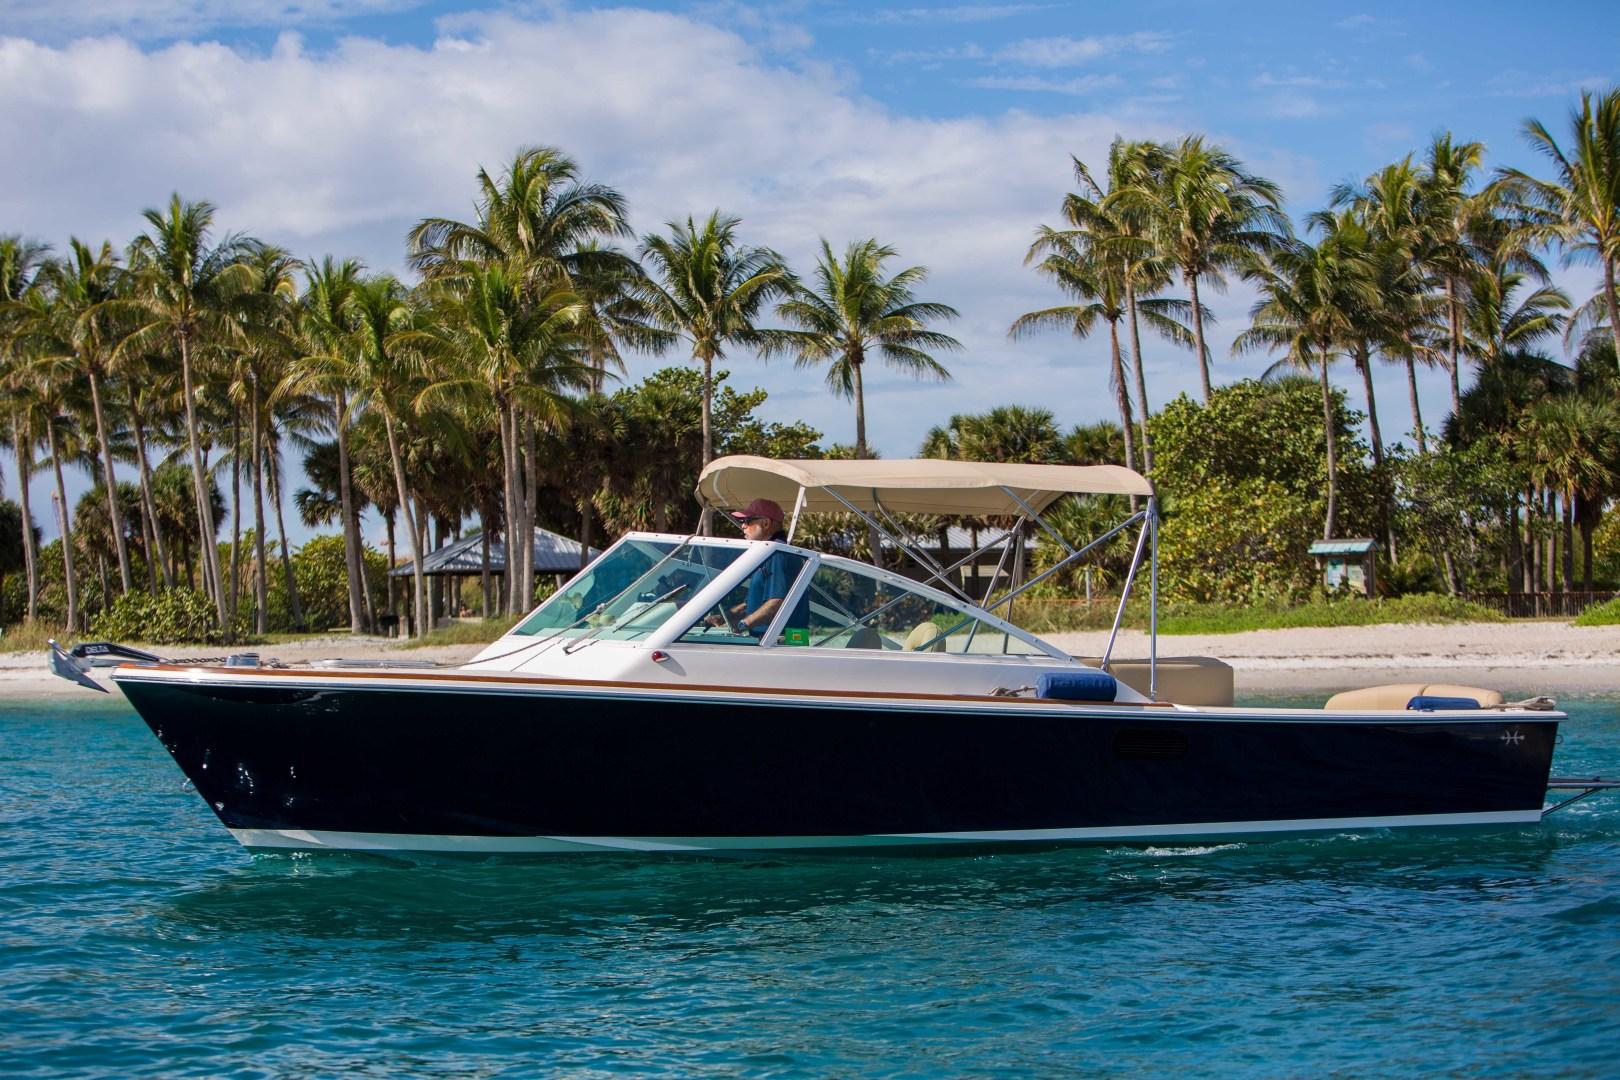 Hunt Yachts-Harrier 25 2006-Andiamo Palm Beach-Florida-United States-1614921 | Thumbnail